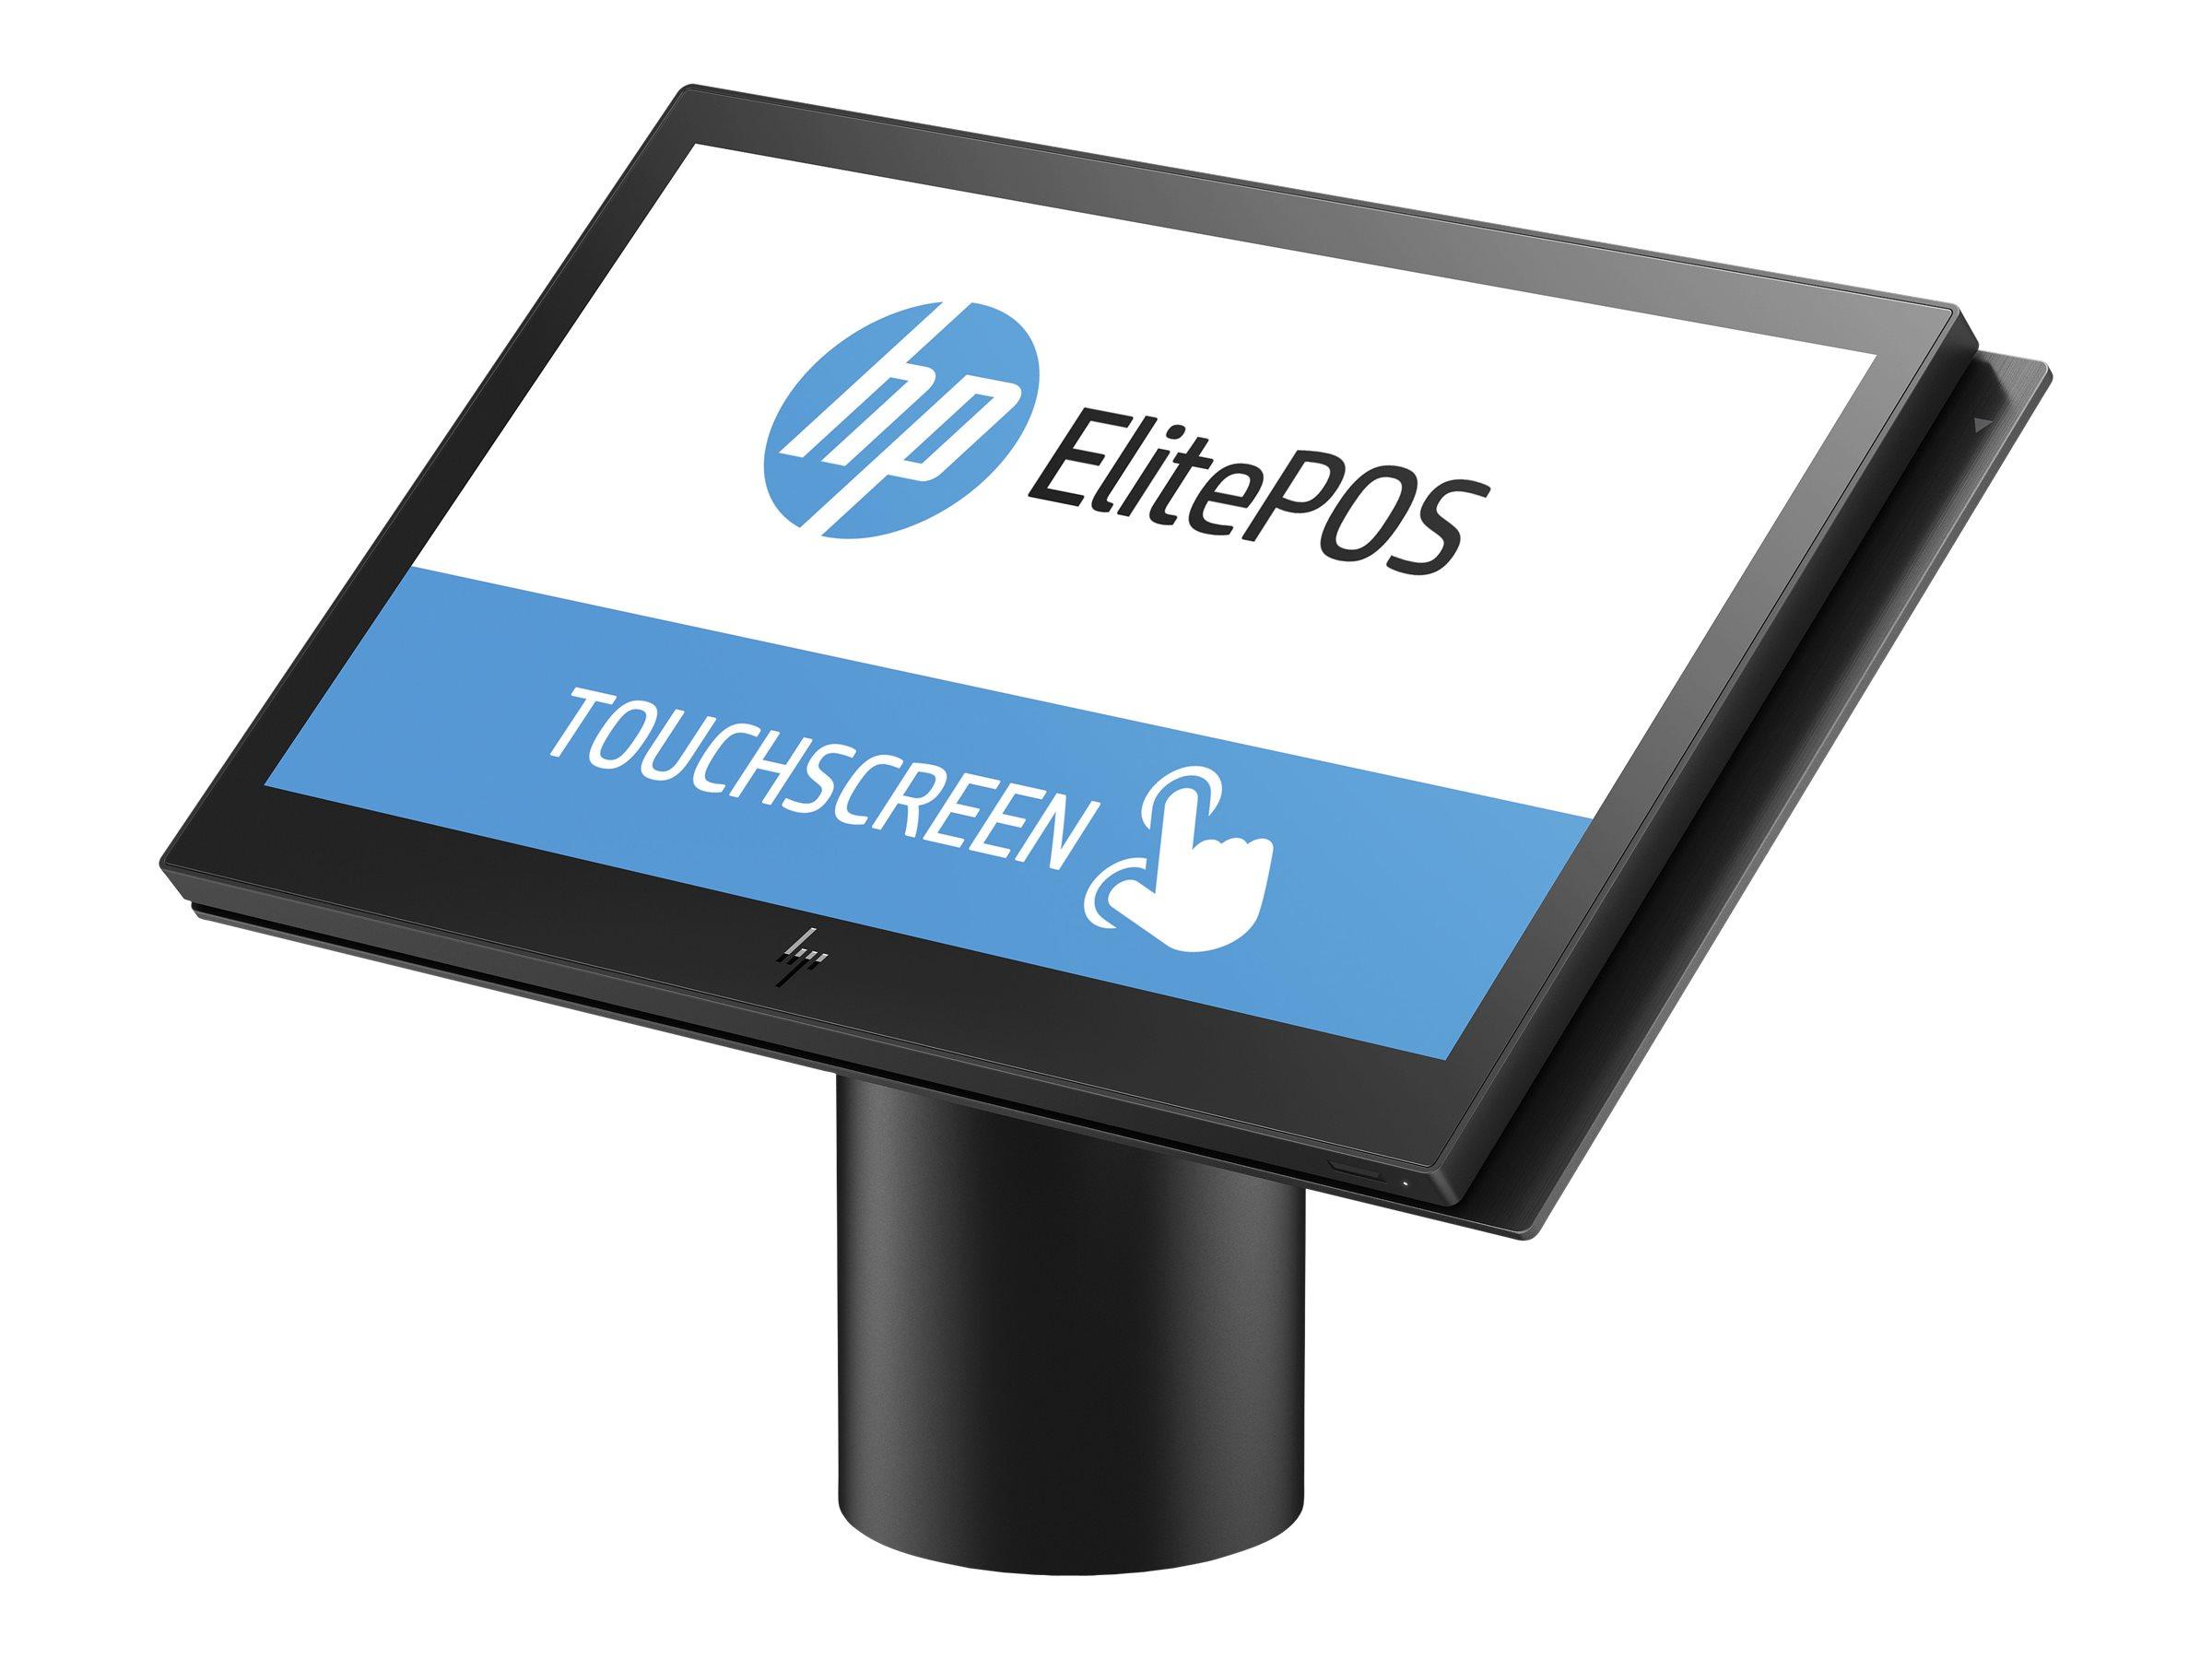 HP ElitePOS G1 Retail System 141 - All-in-One (Komplettlösung) - 1 x Celeron 3965U / 2.2 GHz - RAM 4 GB - SSD 128 GB - TLC